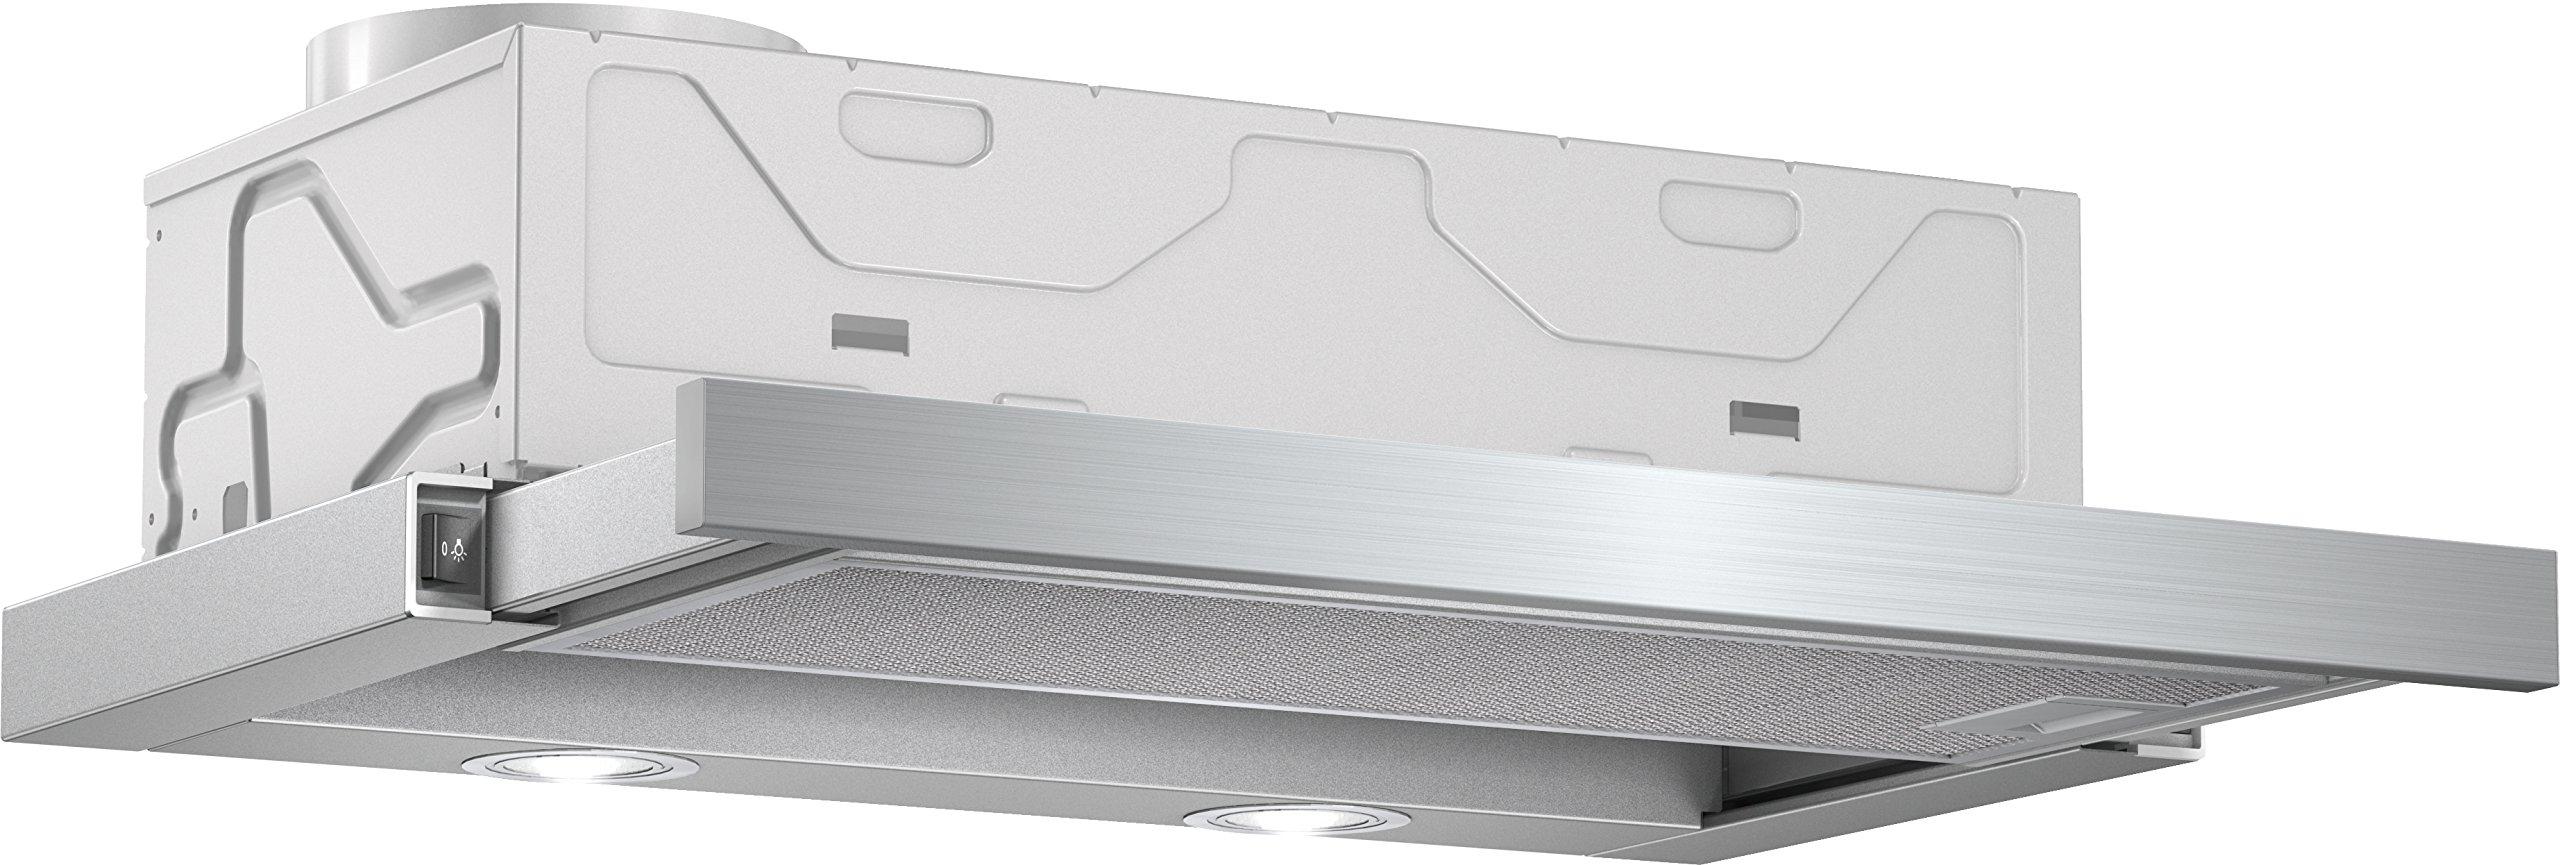 Balay 3BT840X - Campana (400 m³/h, Canalizado, C, E, B, 68 dB): 144.28: Amazon.es: Grandes electrodomésticos